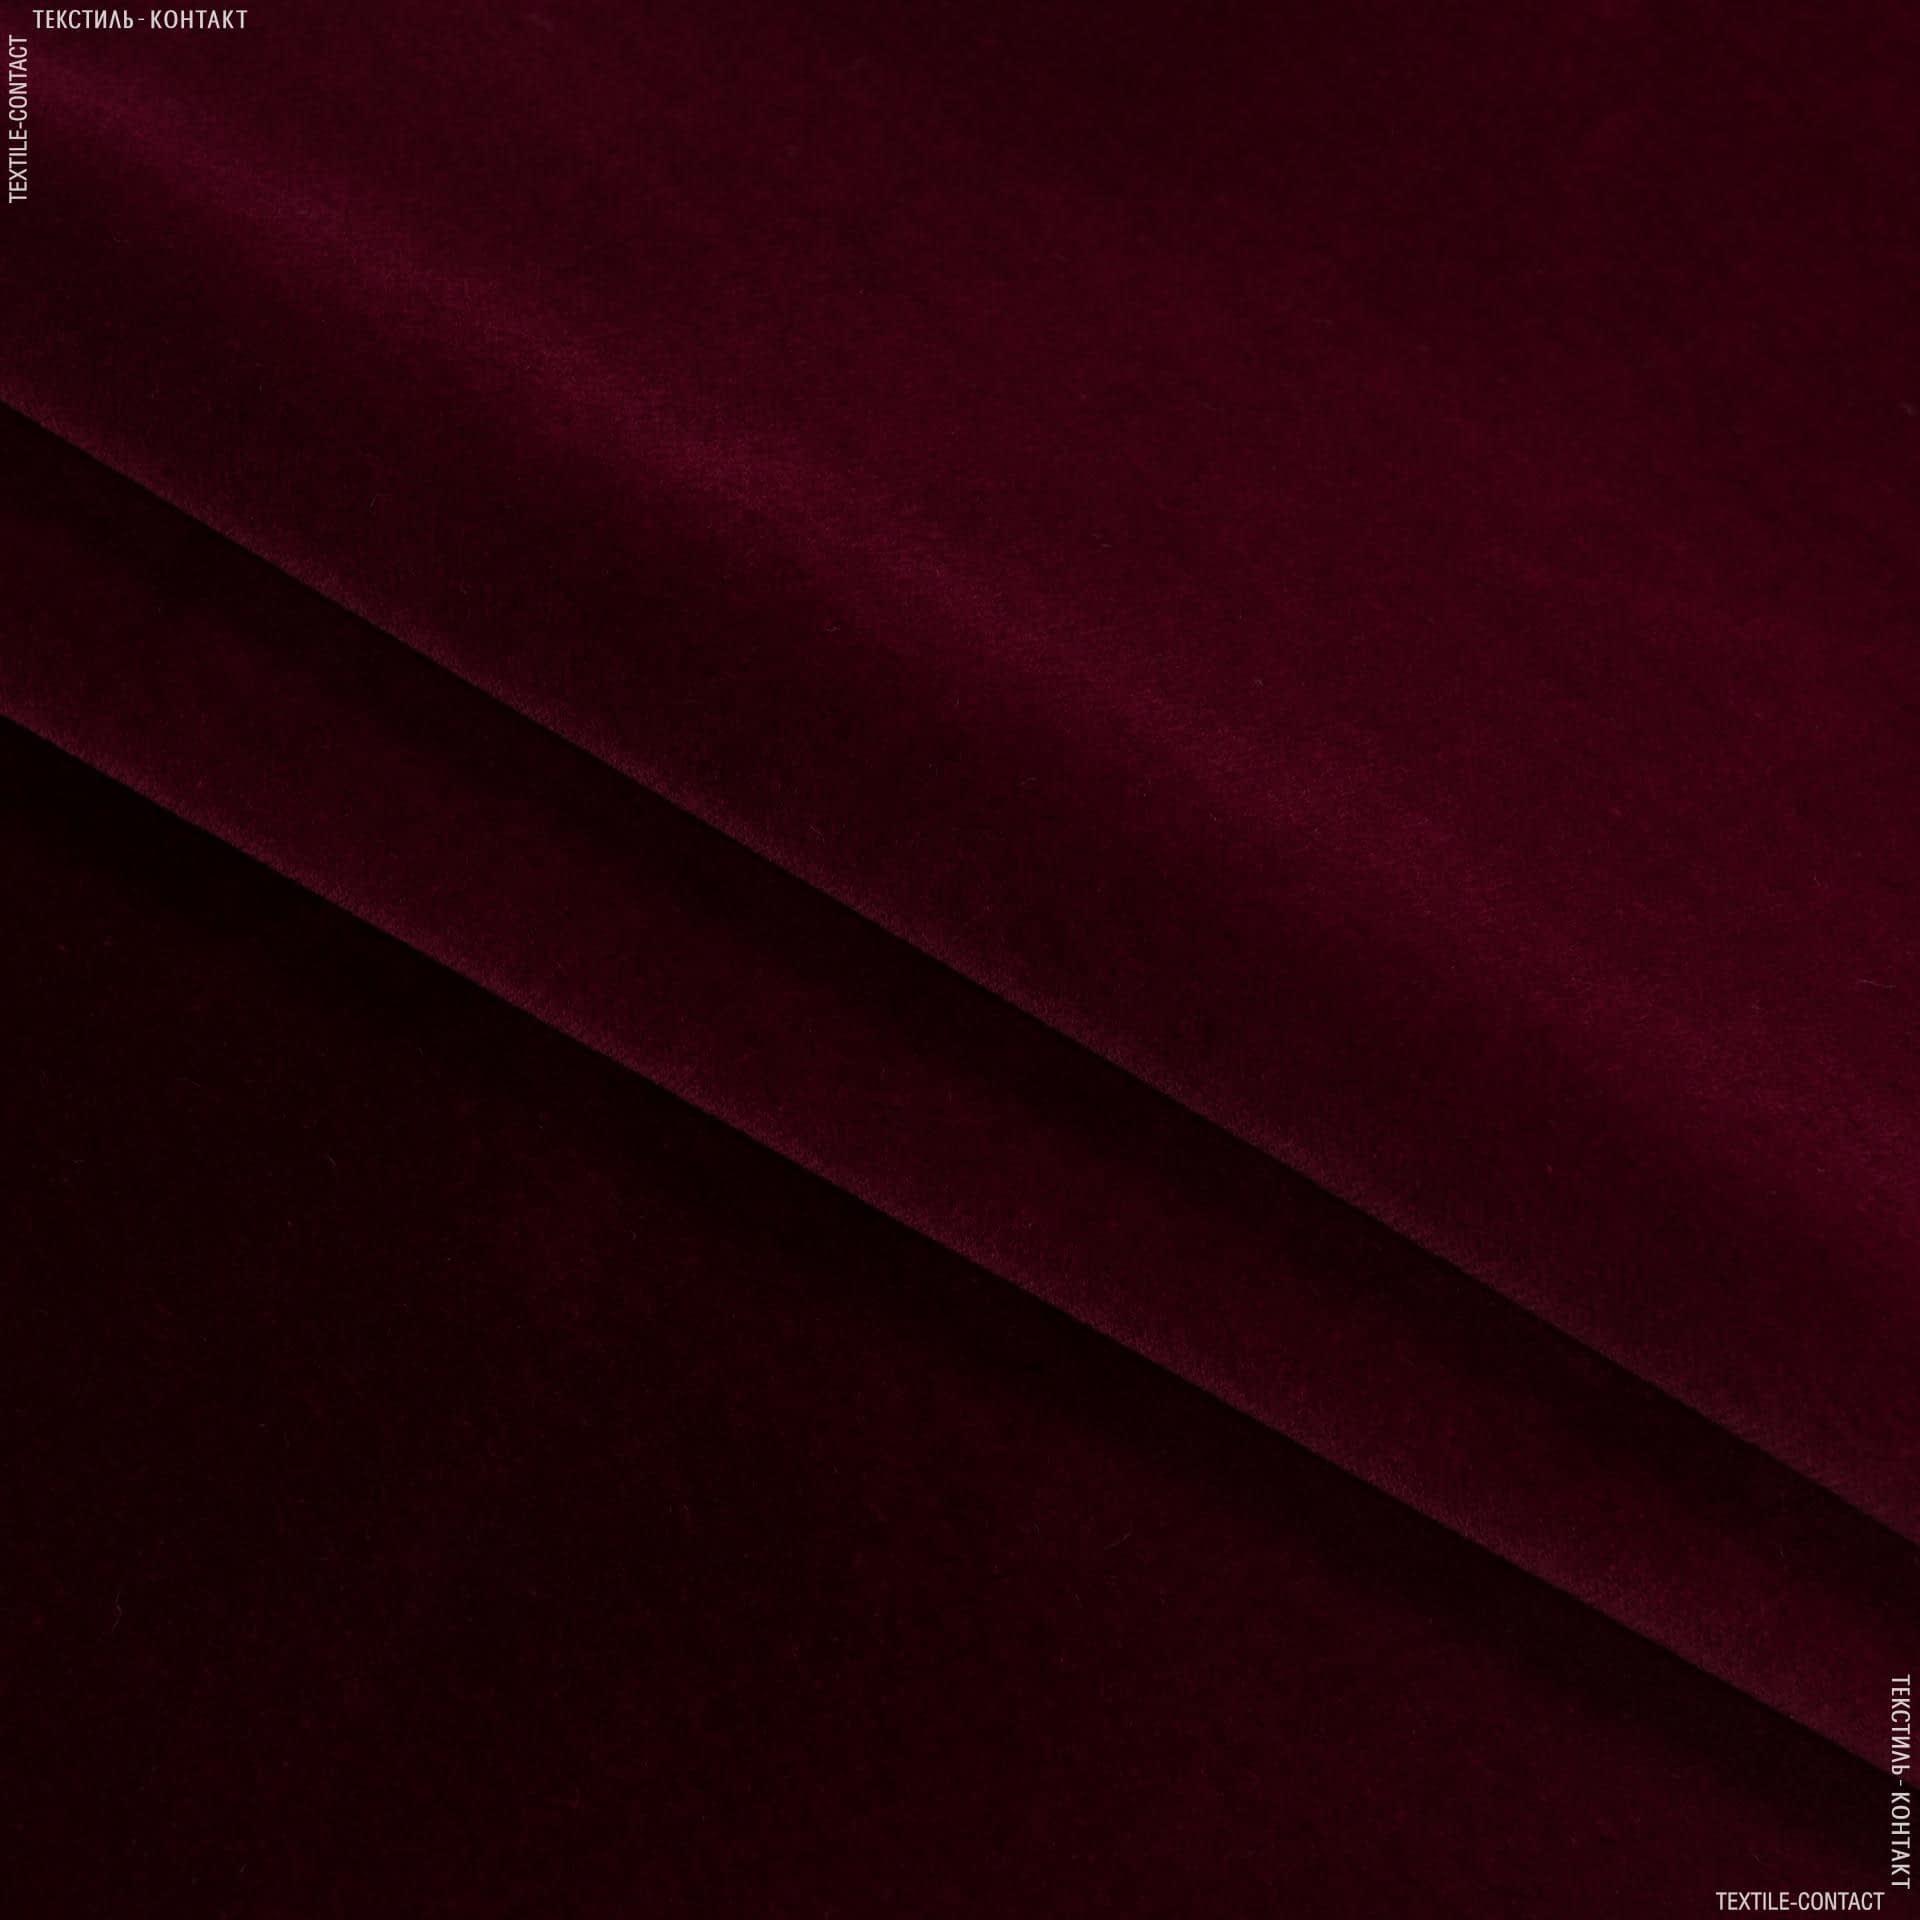 Ткани для мебели - Велюр гласгов/ glasgow  бургунди